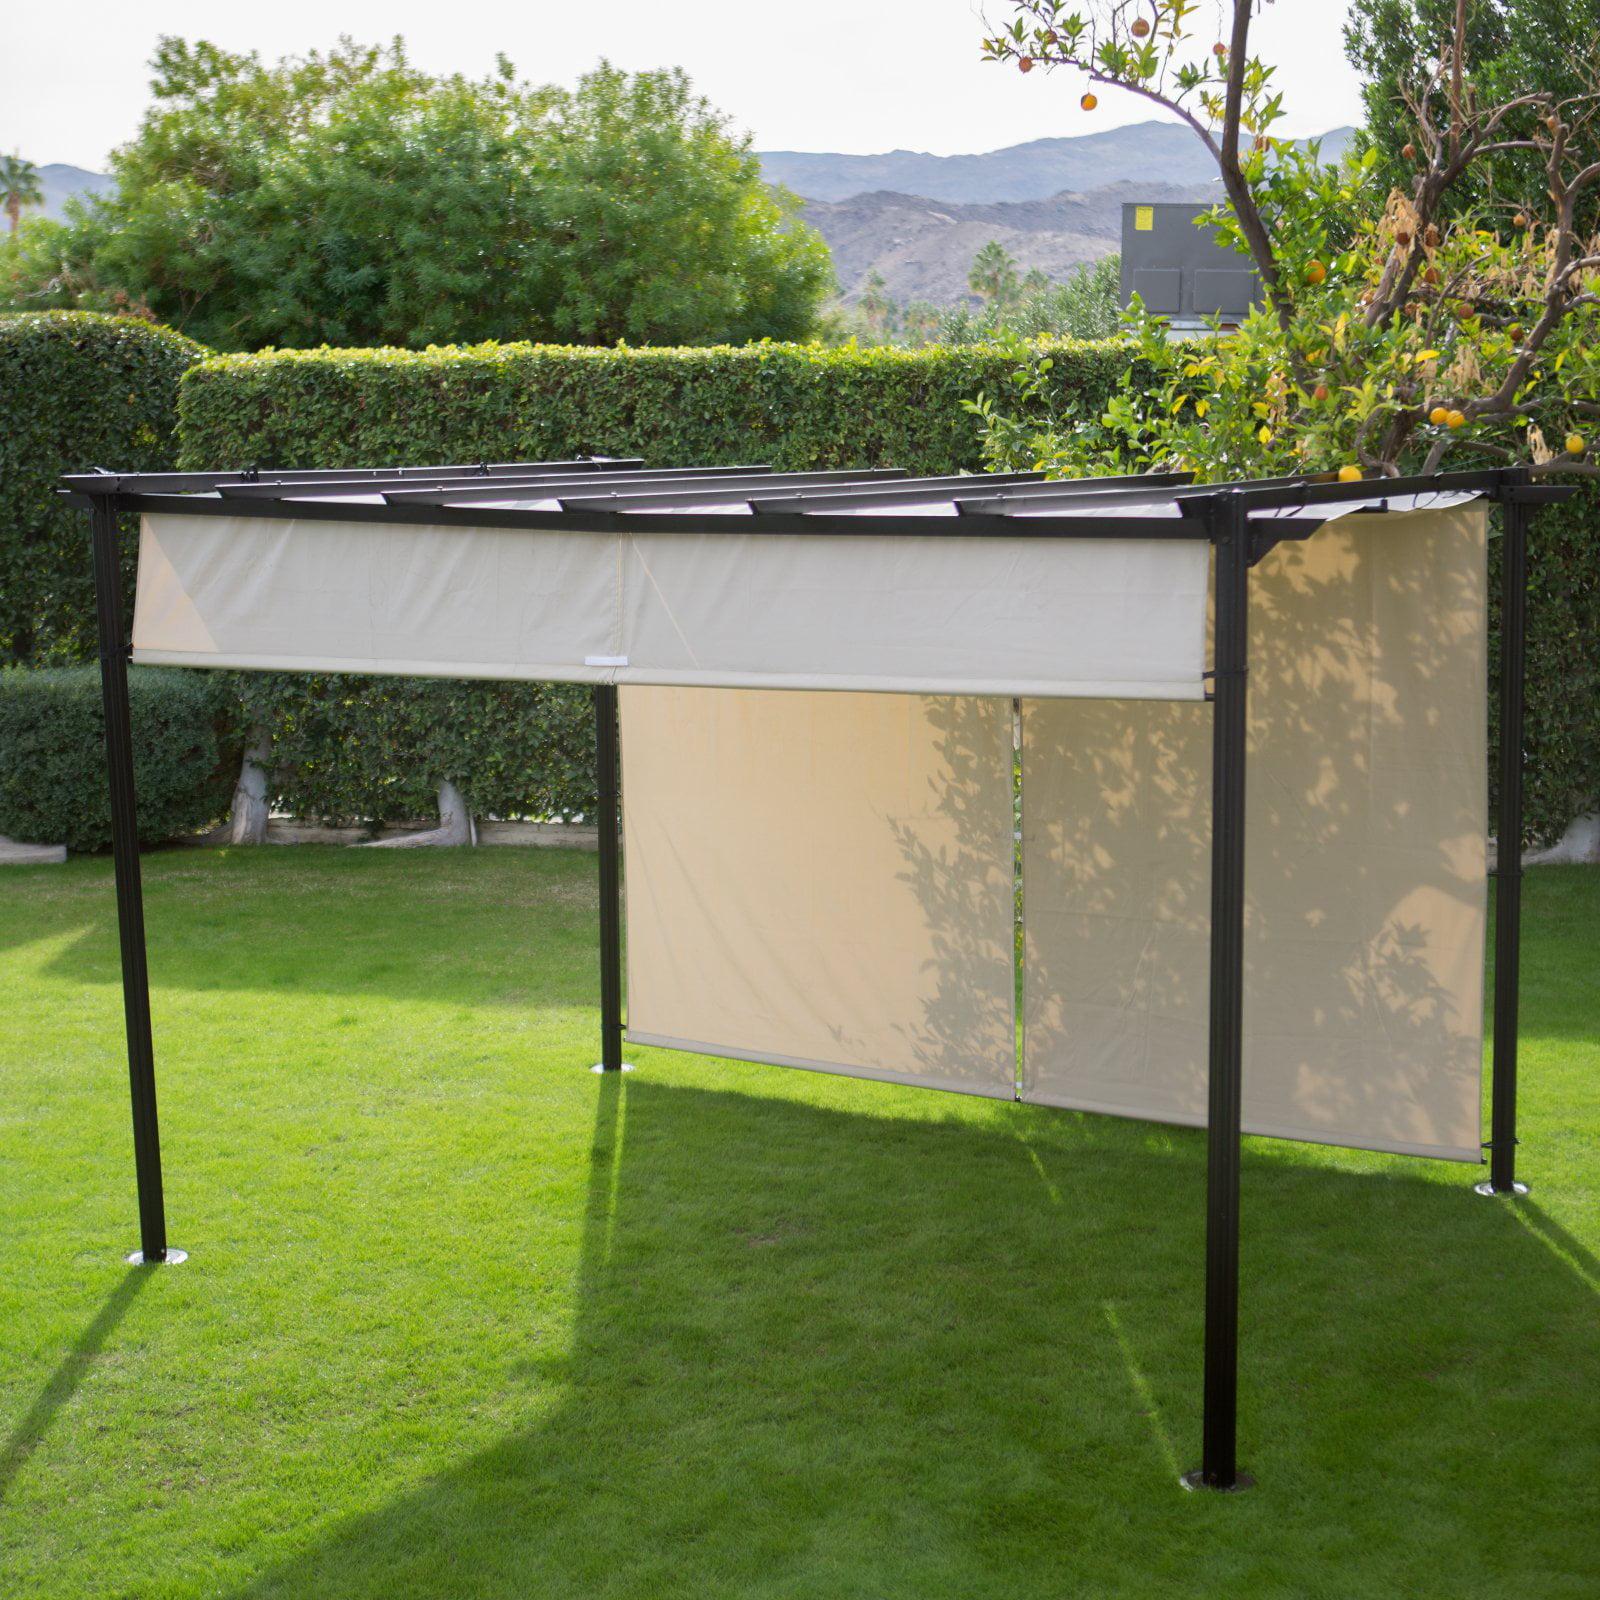 Belham Living Steel Outdoor Pergola Gazebo With Retractable Canopy